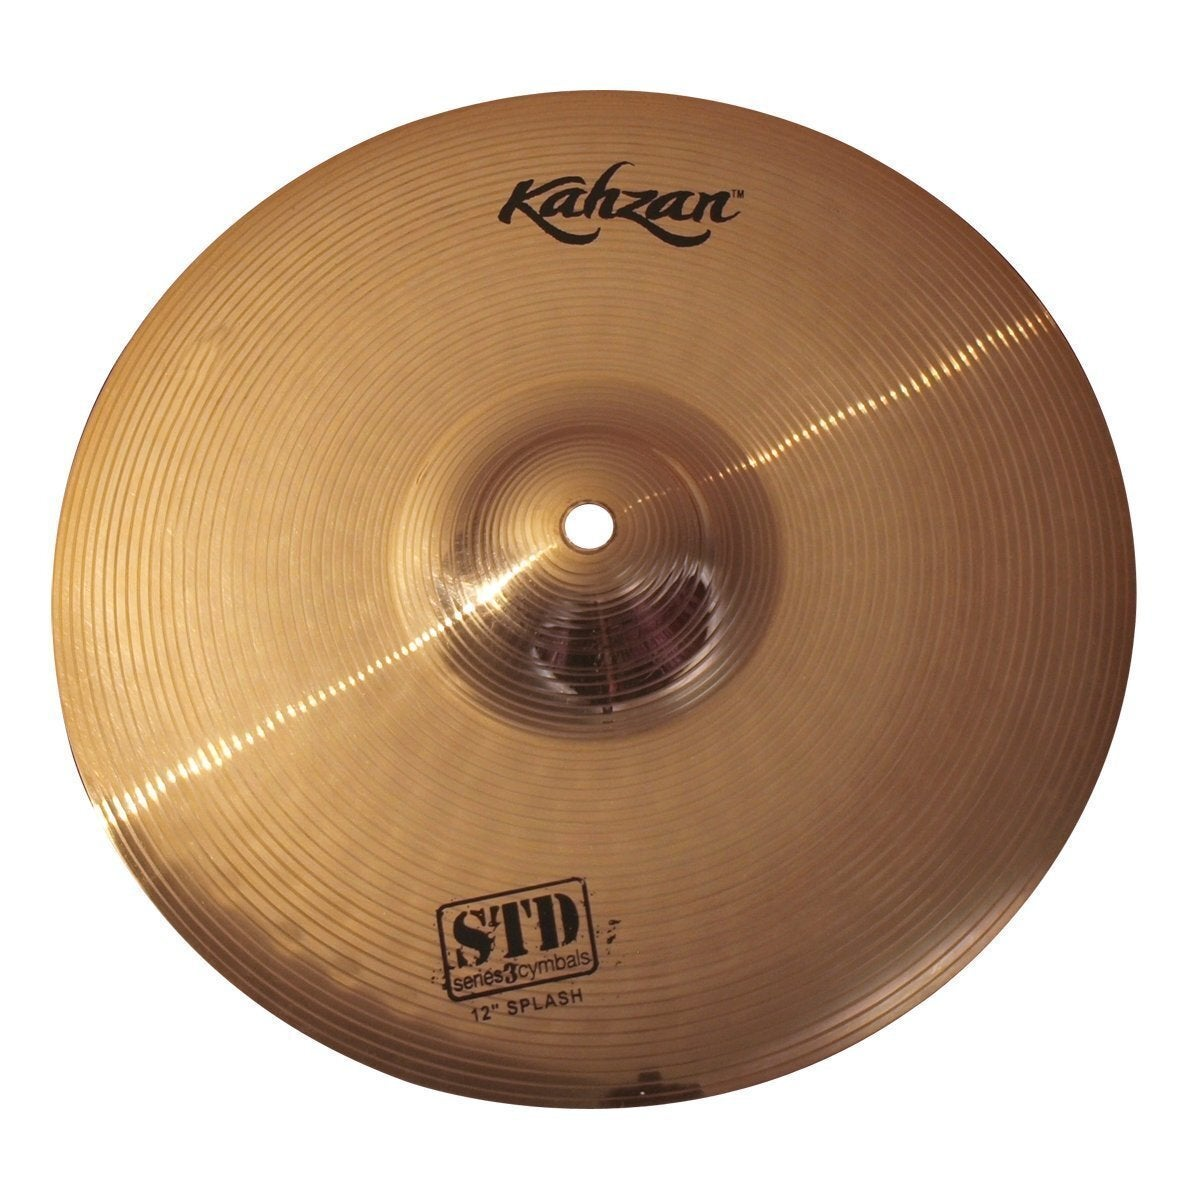 "Kahzan 'STD-3 Series' Splash Cymbal 12"""